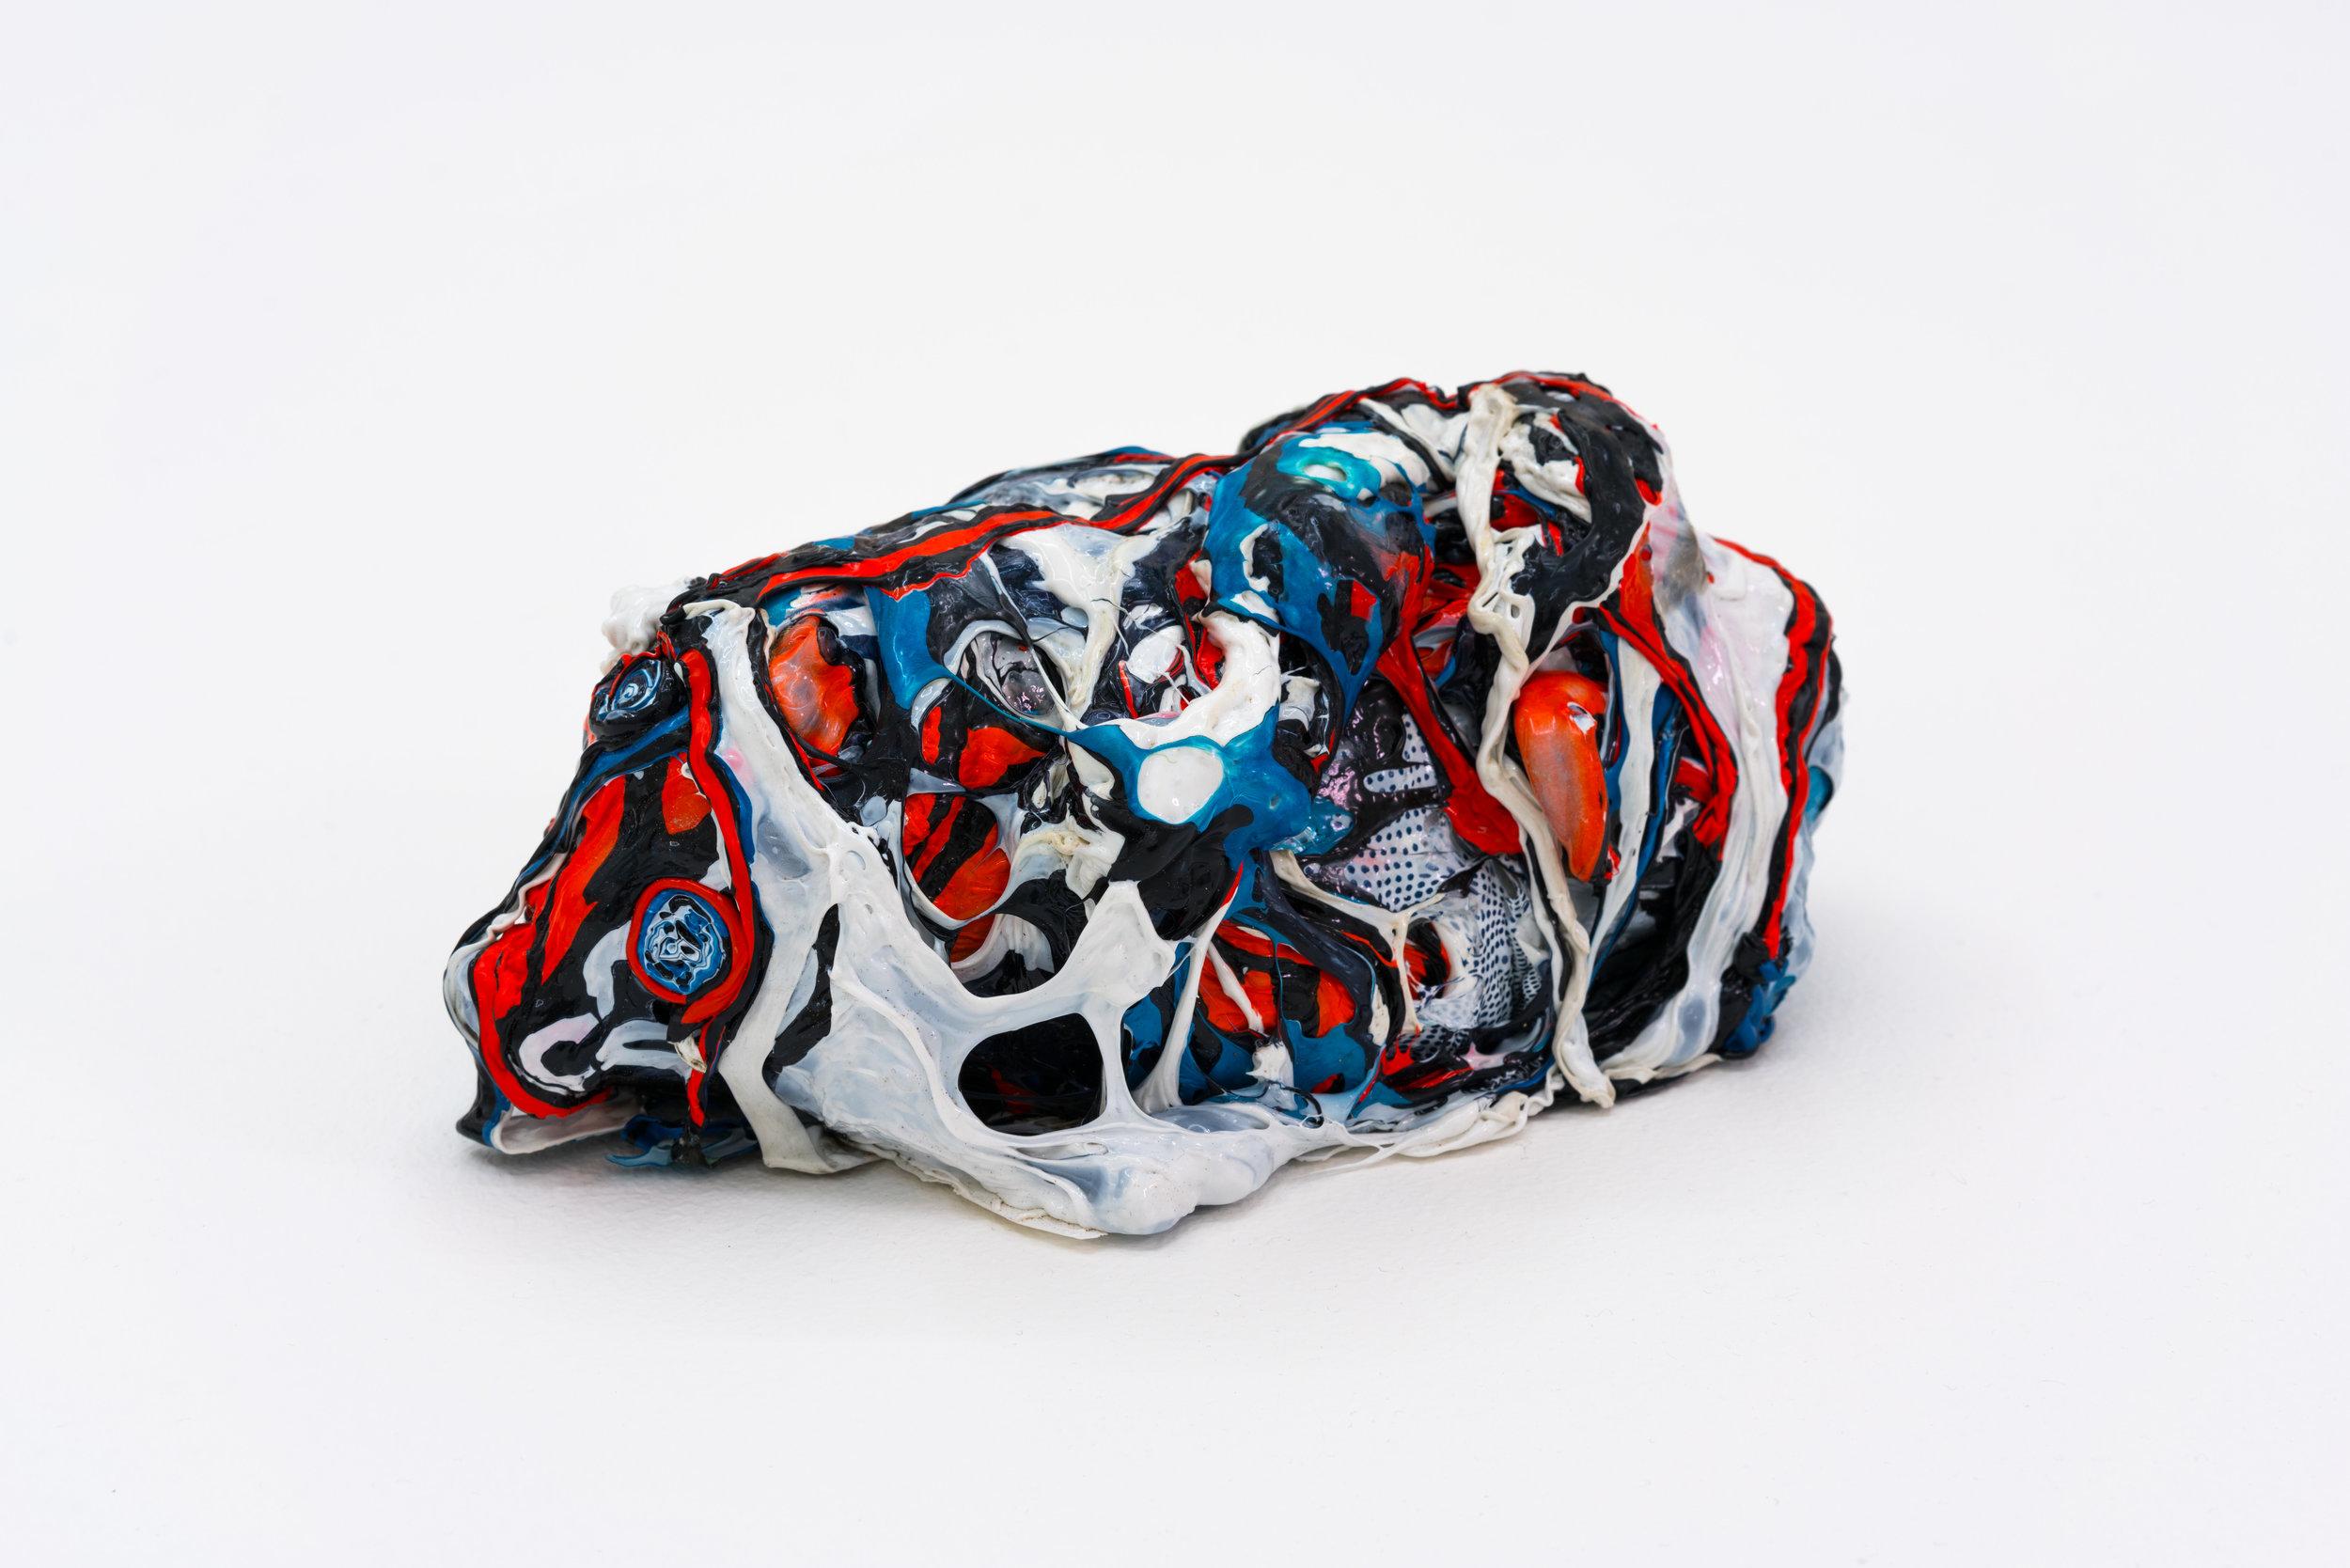 Remko Scha,  Plastic Meltdown , 1962-1992, Plastic, 9 x 19 x 11 cm